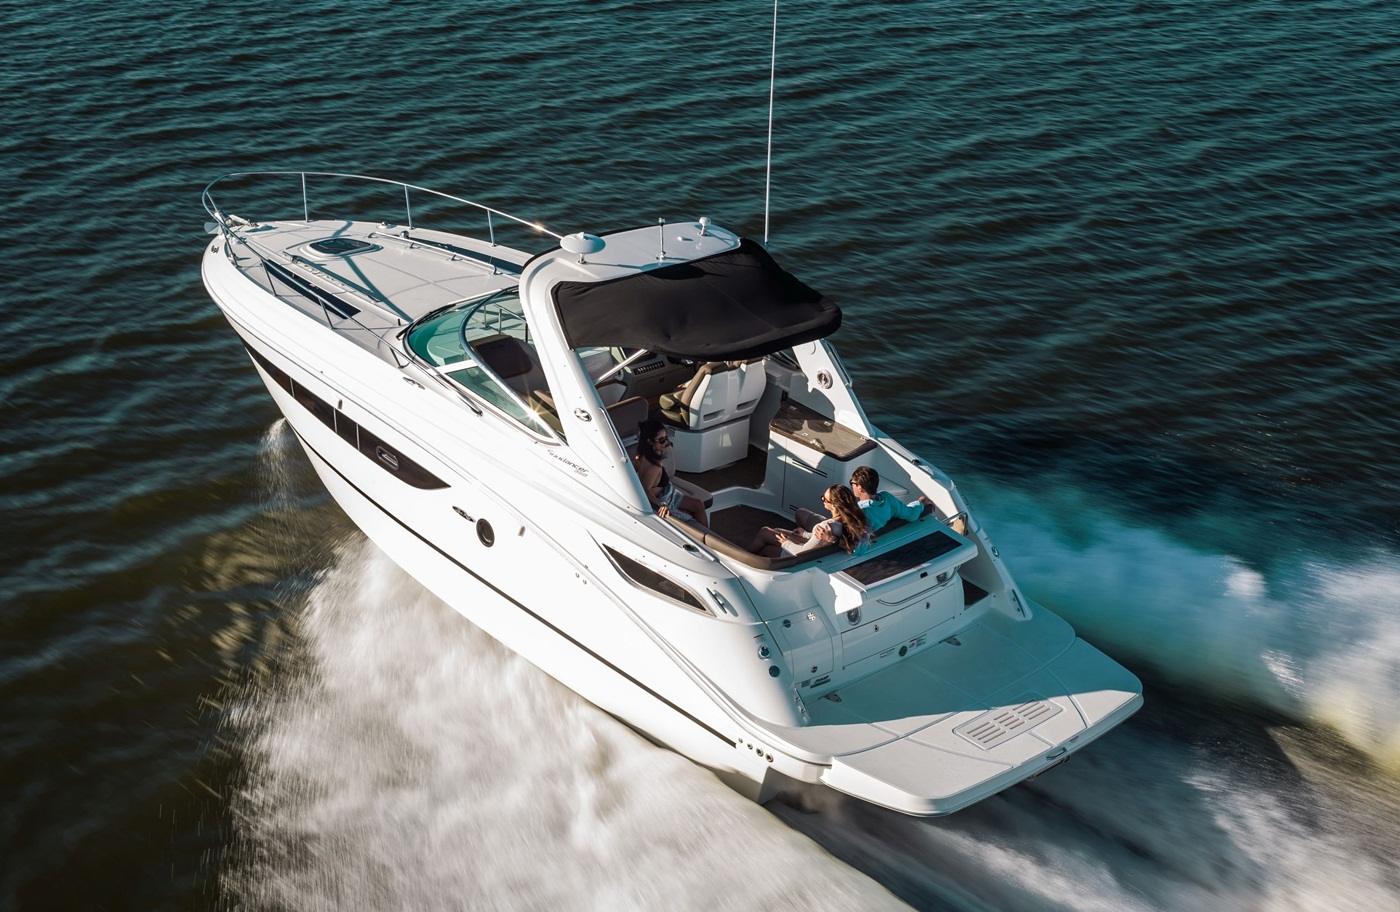 2015 Sea Ray 350 Sundancer Power Boat For Sale Www